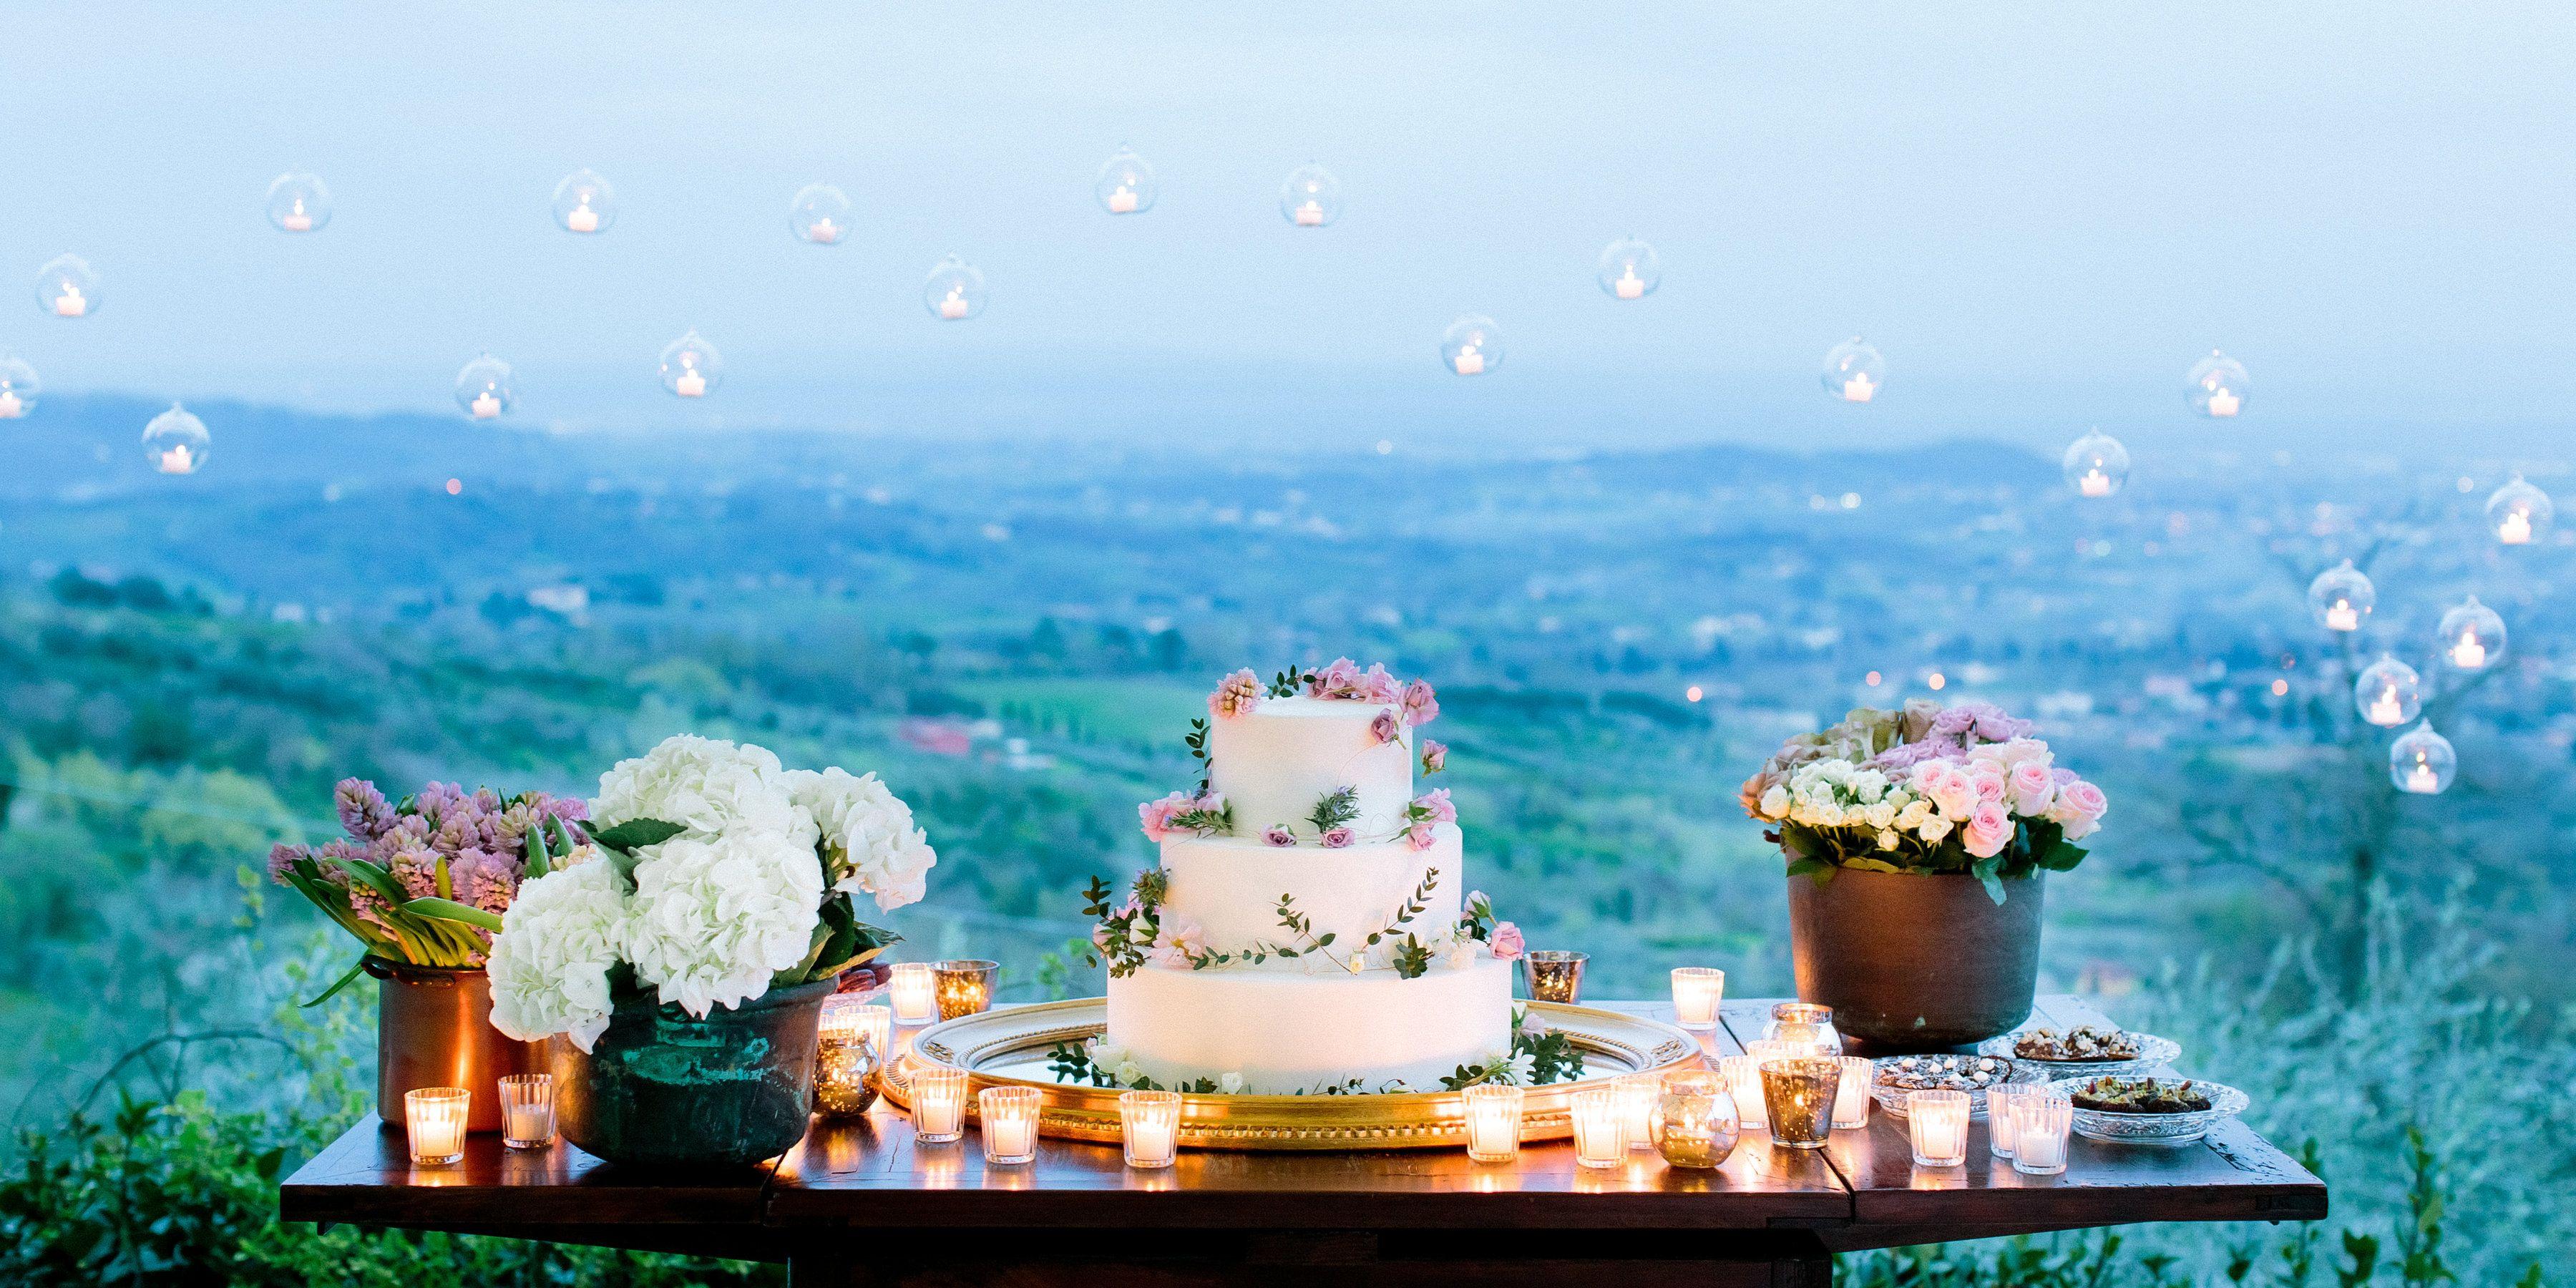 Tuscan Wedding Cake by Angolo Dolce, design by Gabrielle Barsotti, My Tuscan Wedding, and Wedding & Co., photo by faciabenifotografia